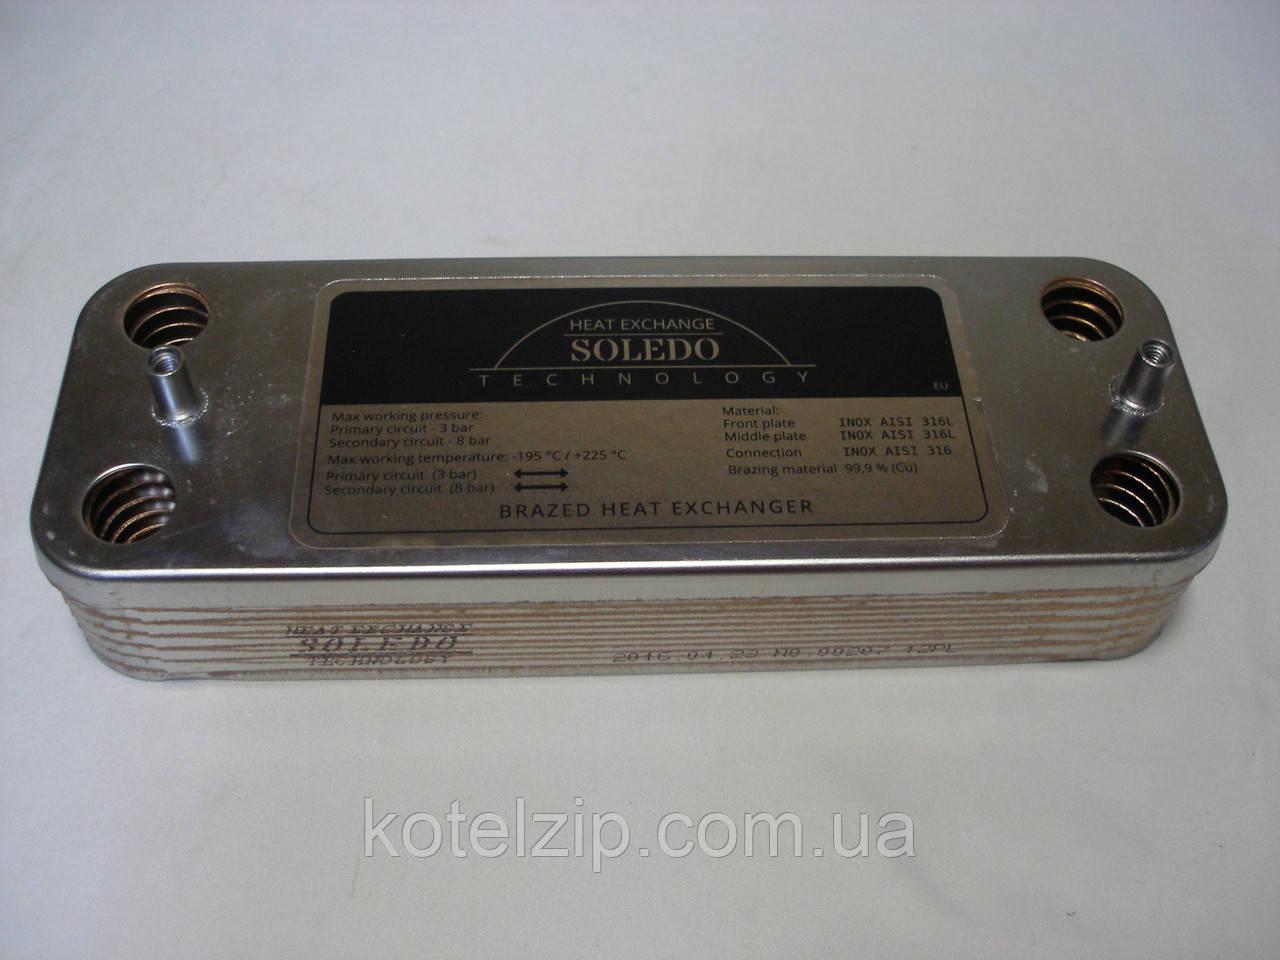 Пластинчатый теплообменник saunier duval трубчатый медный теплообменник